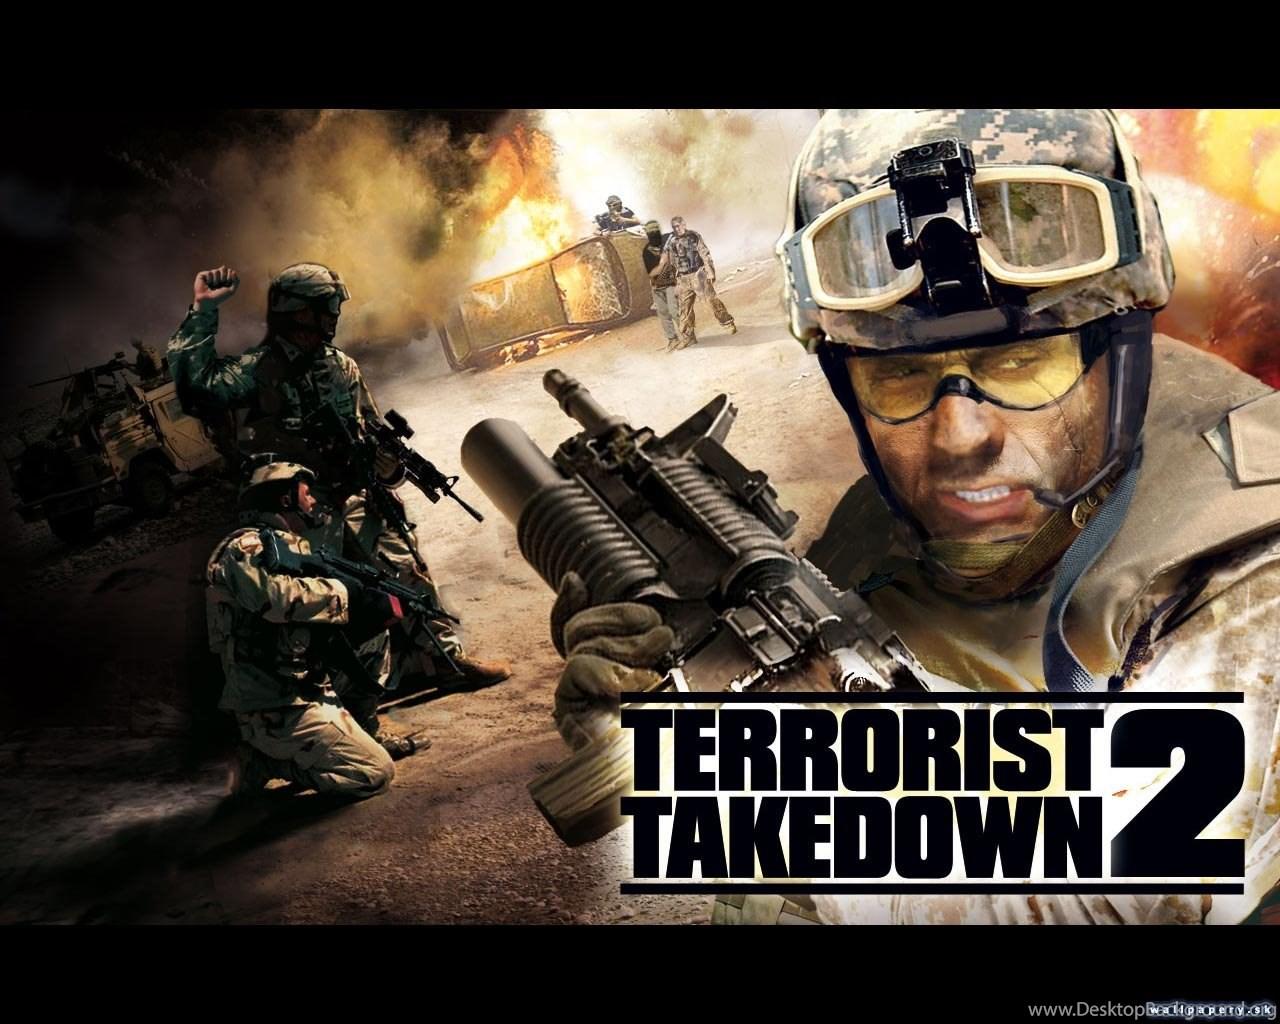 Terrorist Takedown 2 US Navy Seals Wallpapers 1 Desktop Background